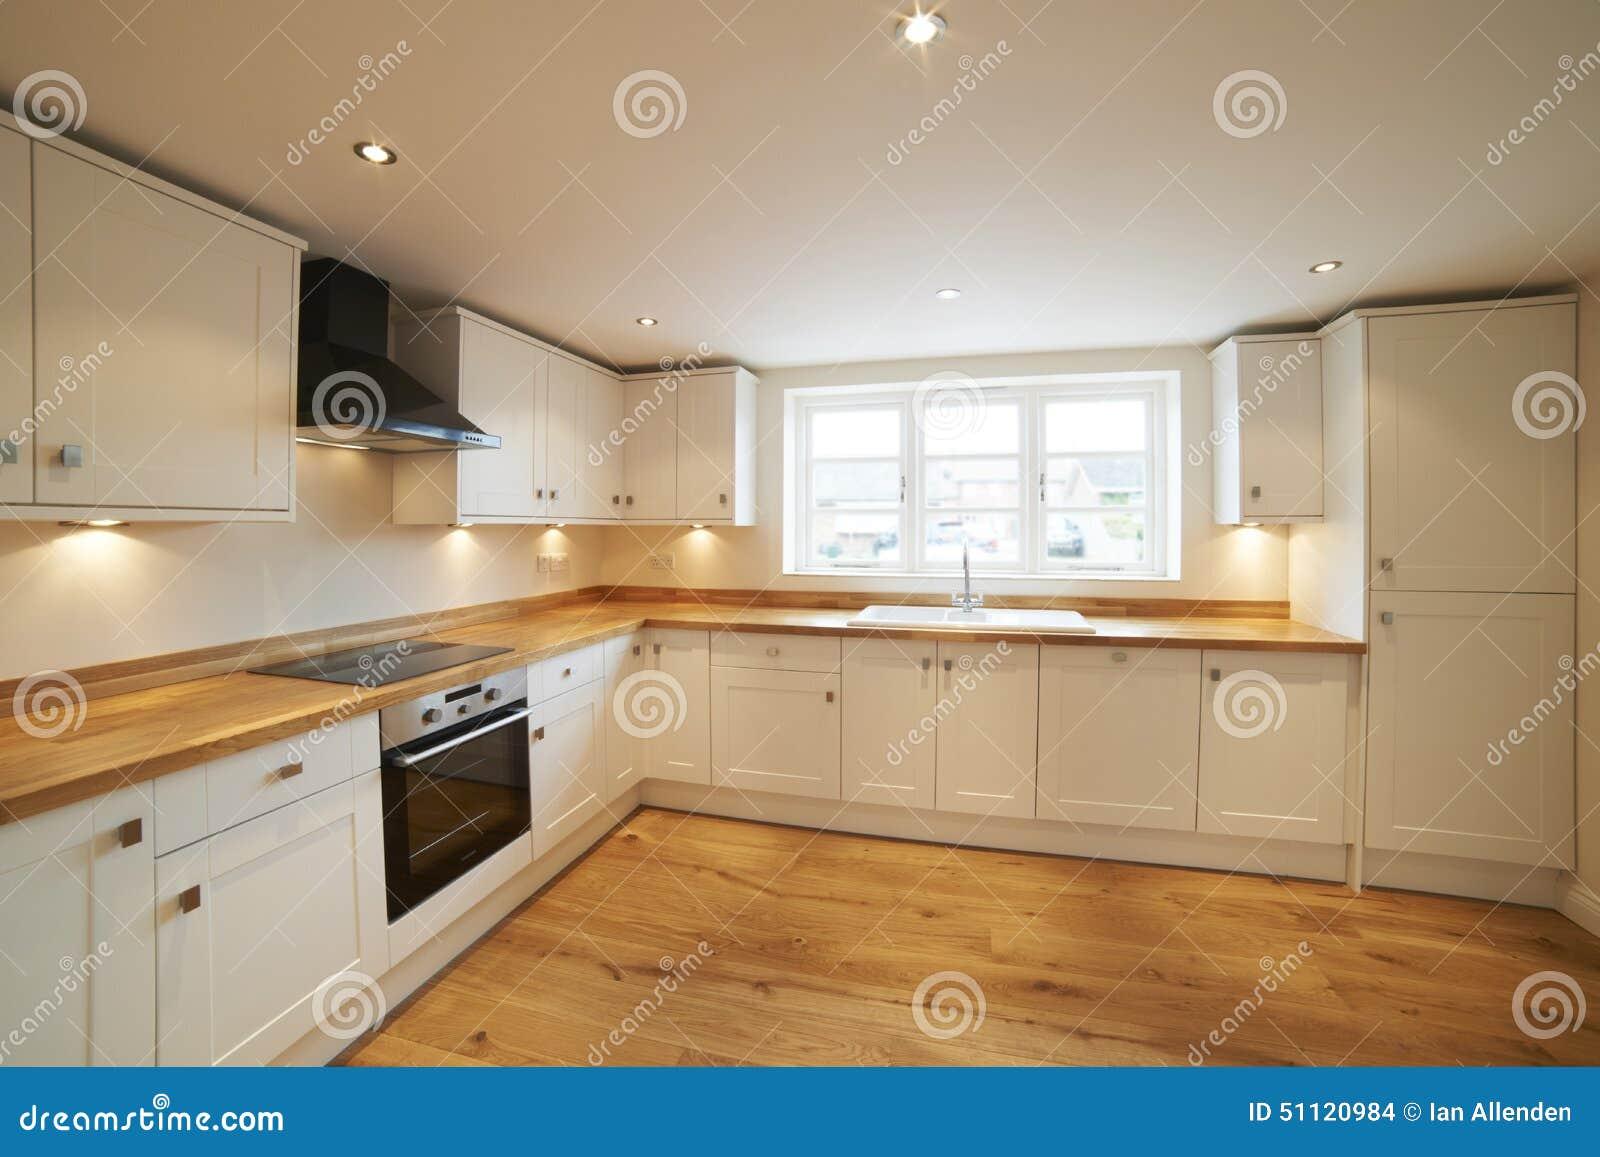 Cocina cabida hermosa en casa moderna con el piso de for Cocinas modernas con piso de madera